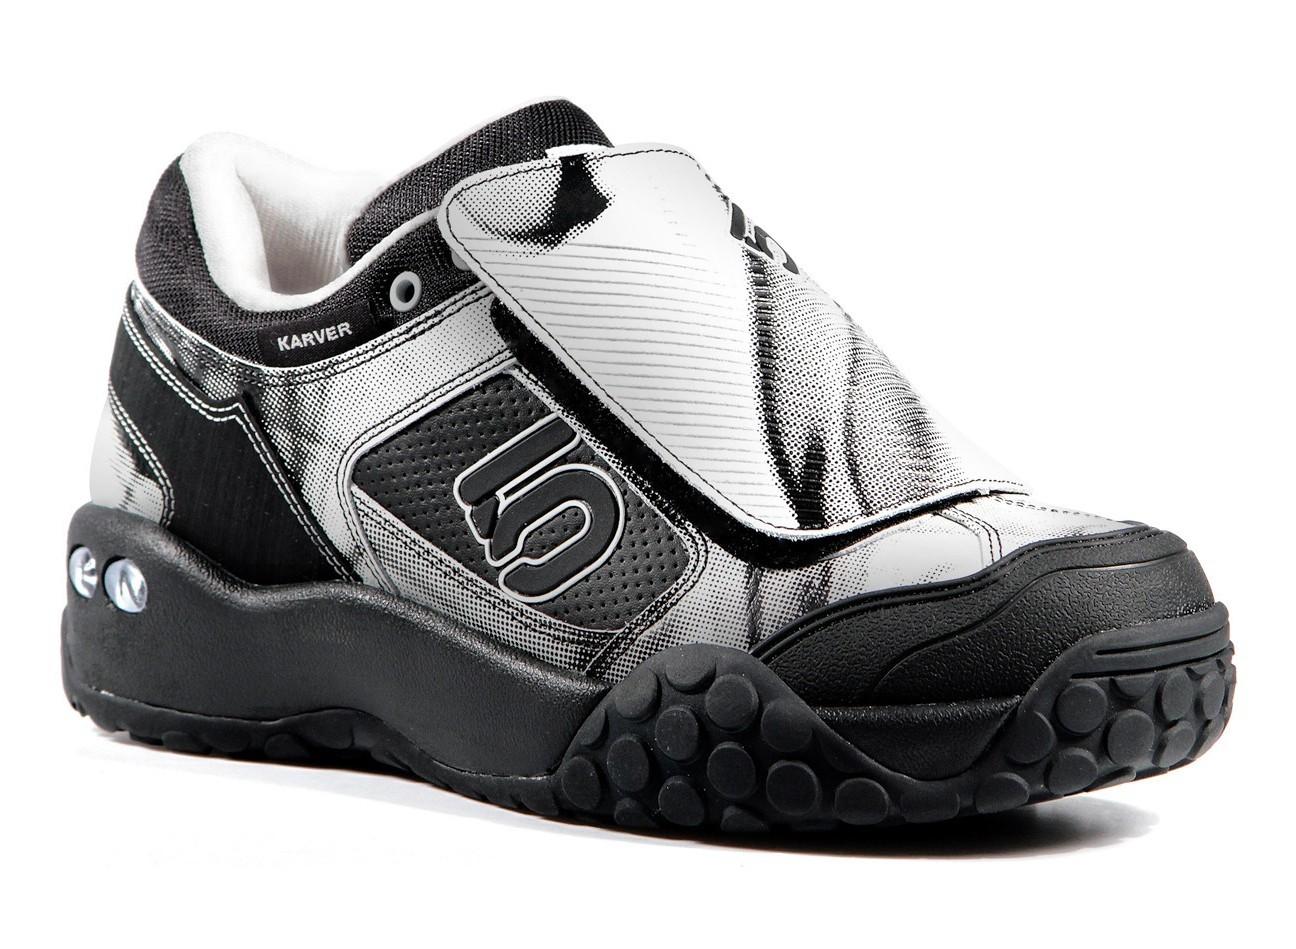 Five Ten Karver (2013) Women's MTB Shoe - Ash Grey